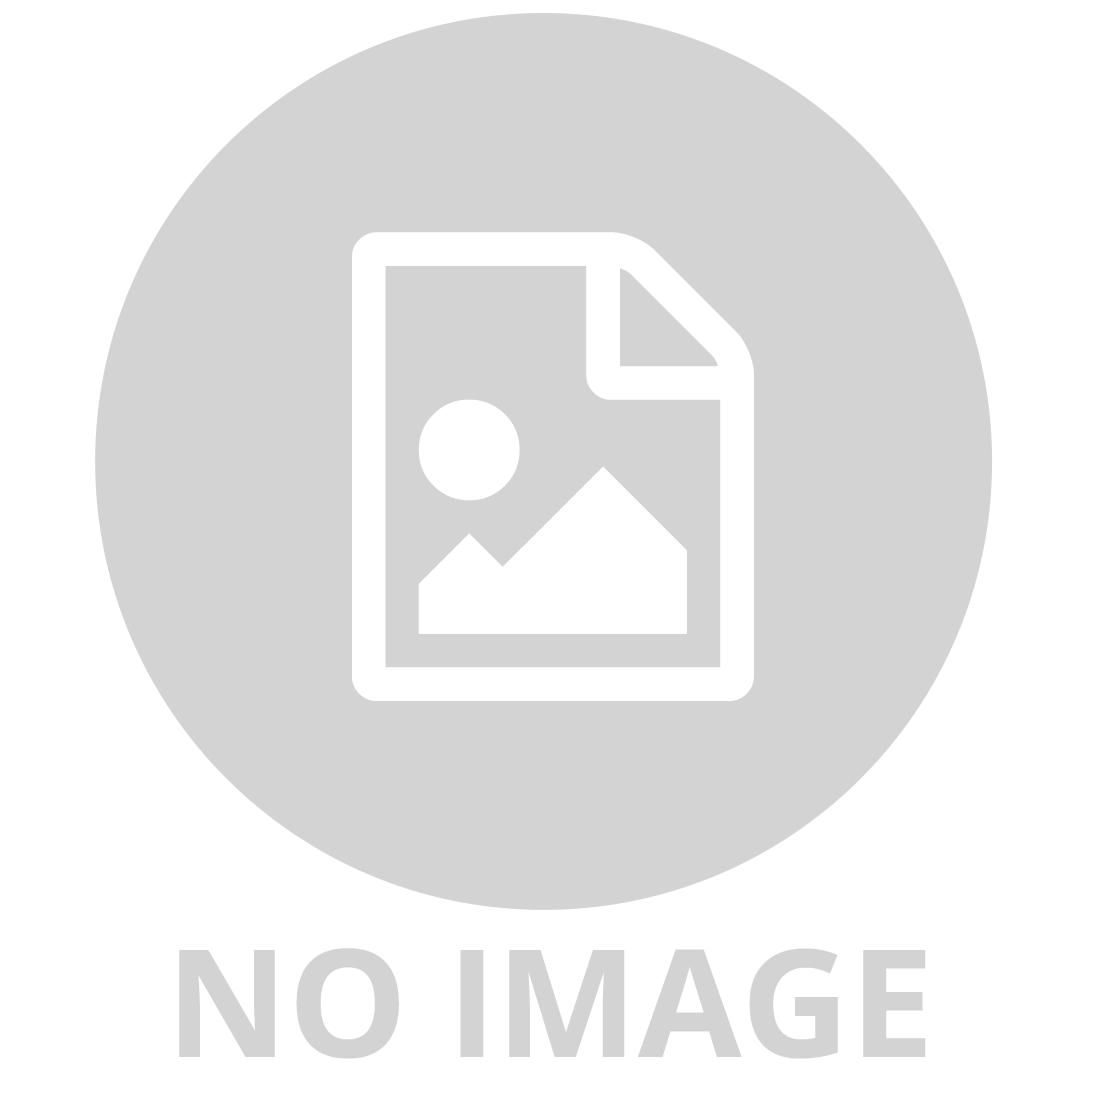 PRESENT PETS KWEENIE/PRINCESS- ROSE GOLD FANCY PUP